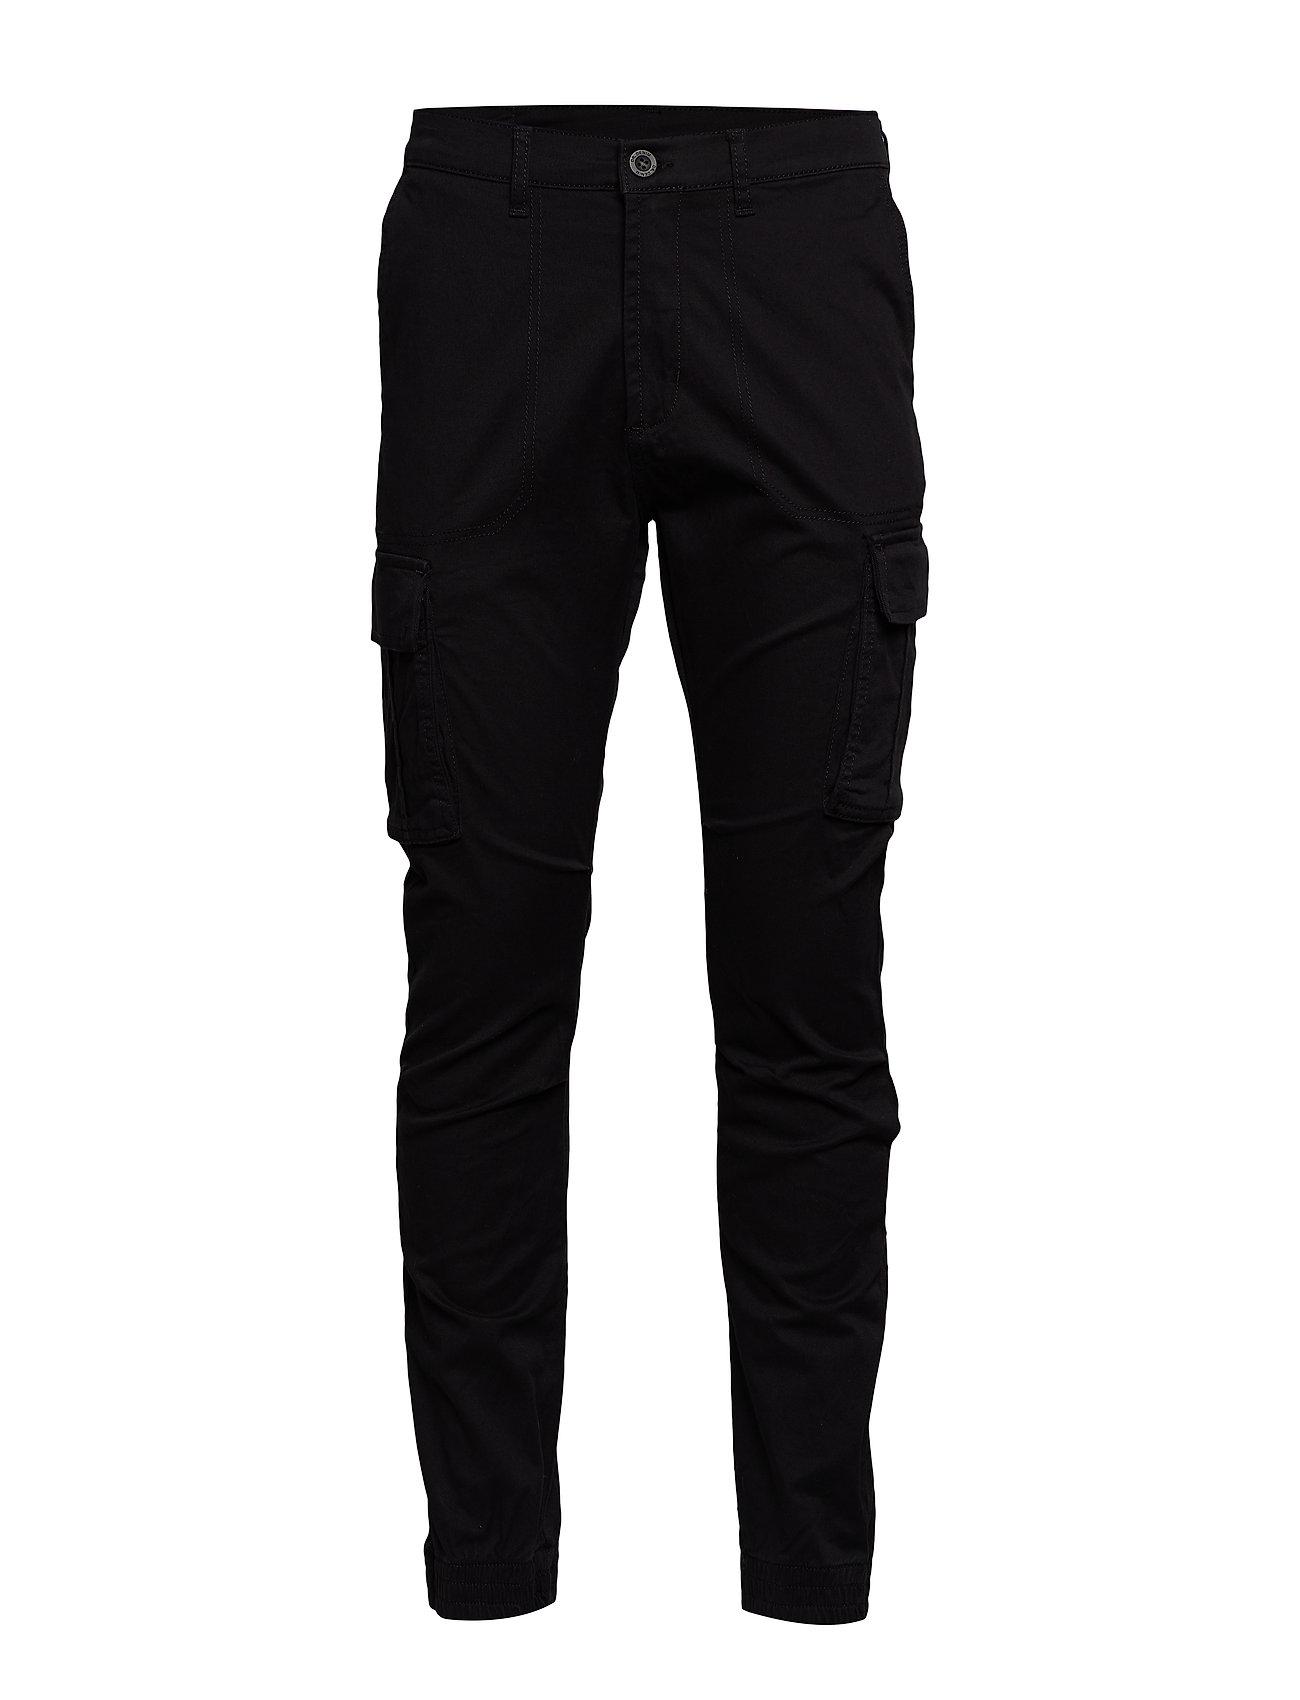 Image of Cooper Cargo Pants Trousers Cargo Pants Sort Dr. Denim (3217409263)